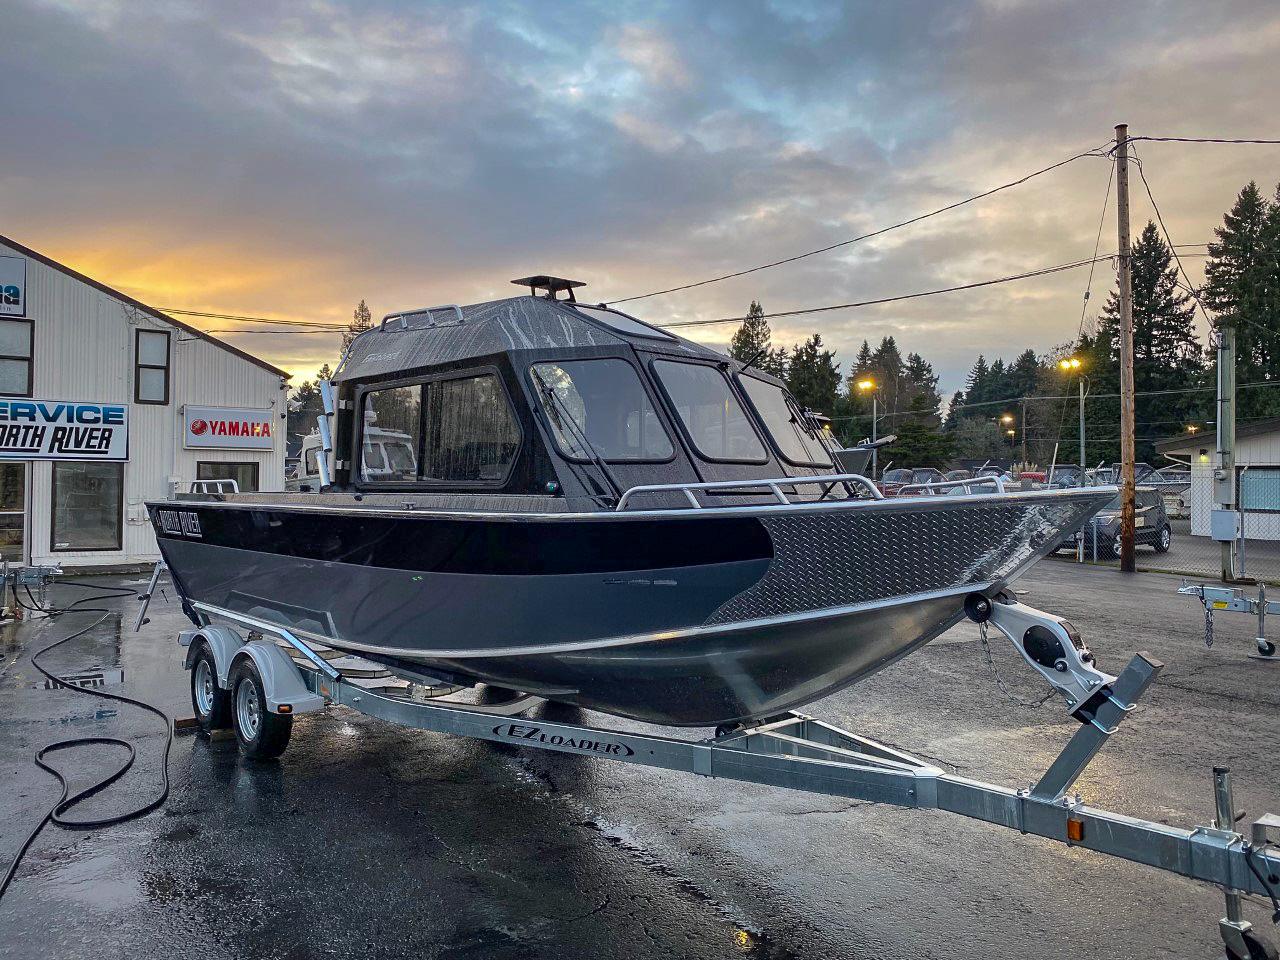 2021 NORTH RIVER 24 Seahawk Fastback